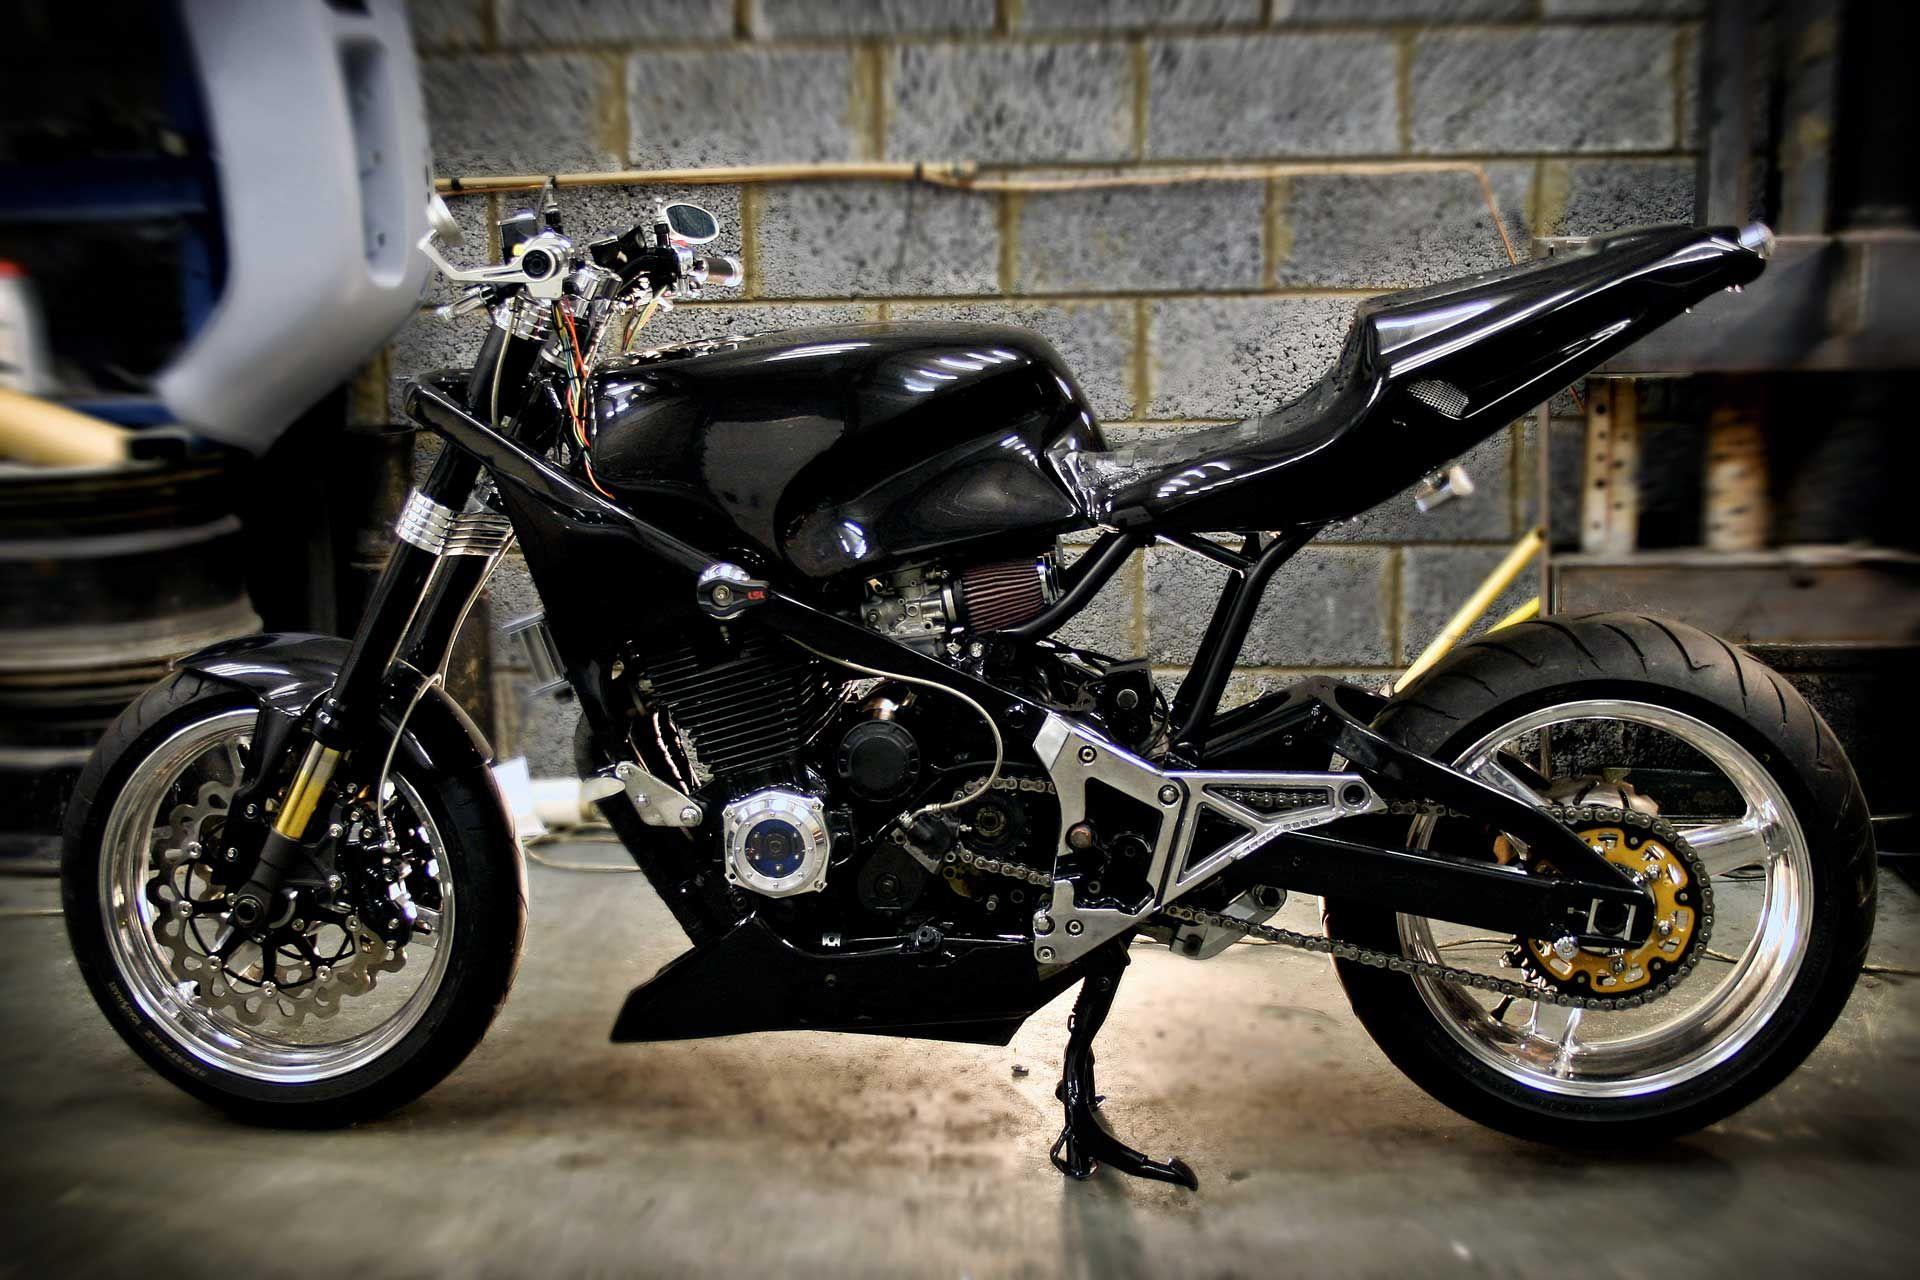 Yamaha FJ 1100 by Metatron Design